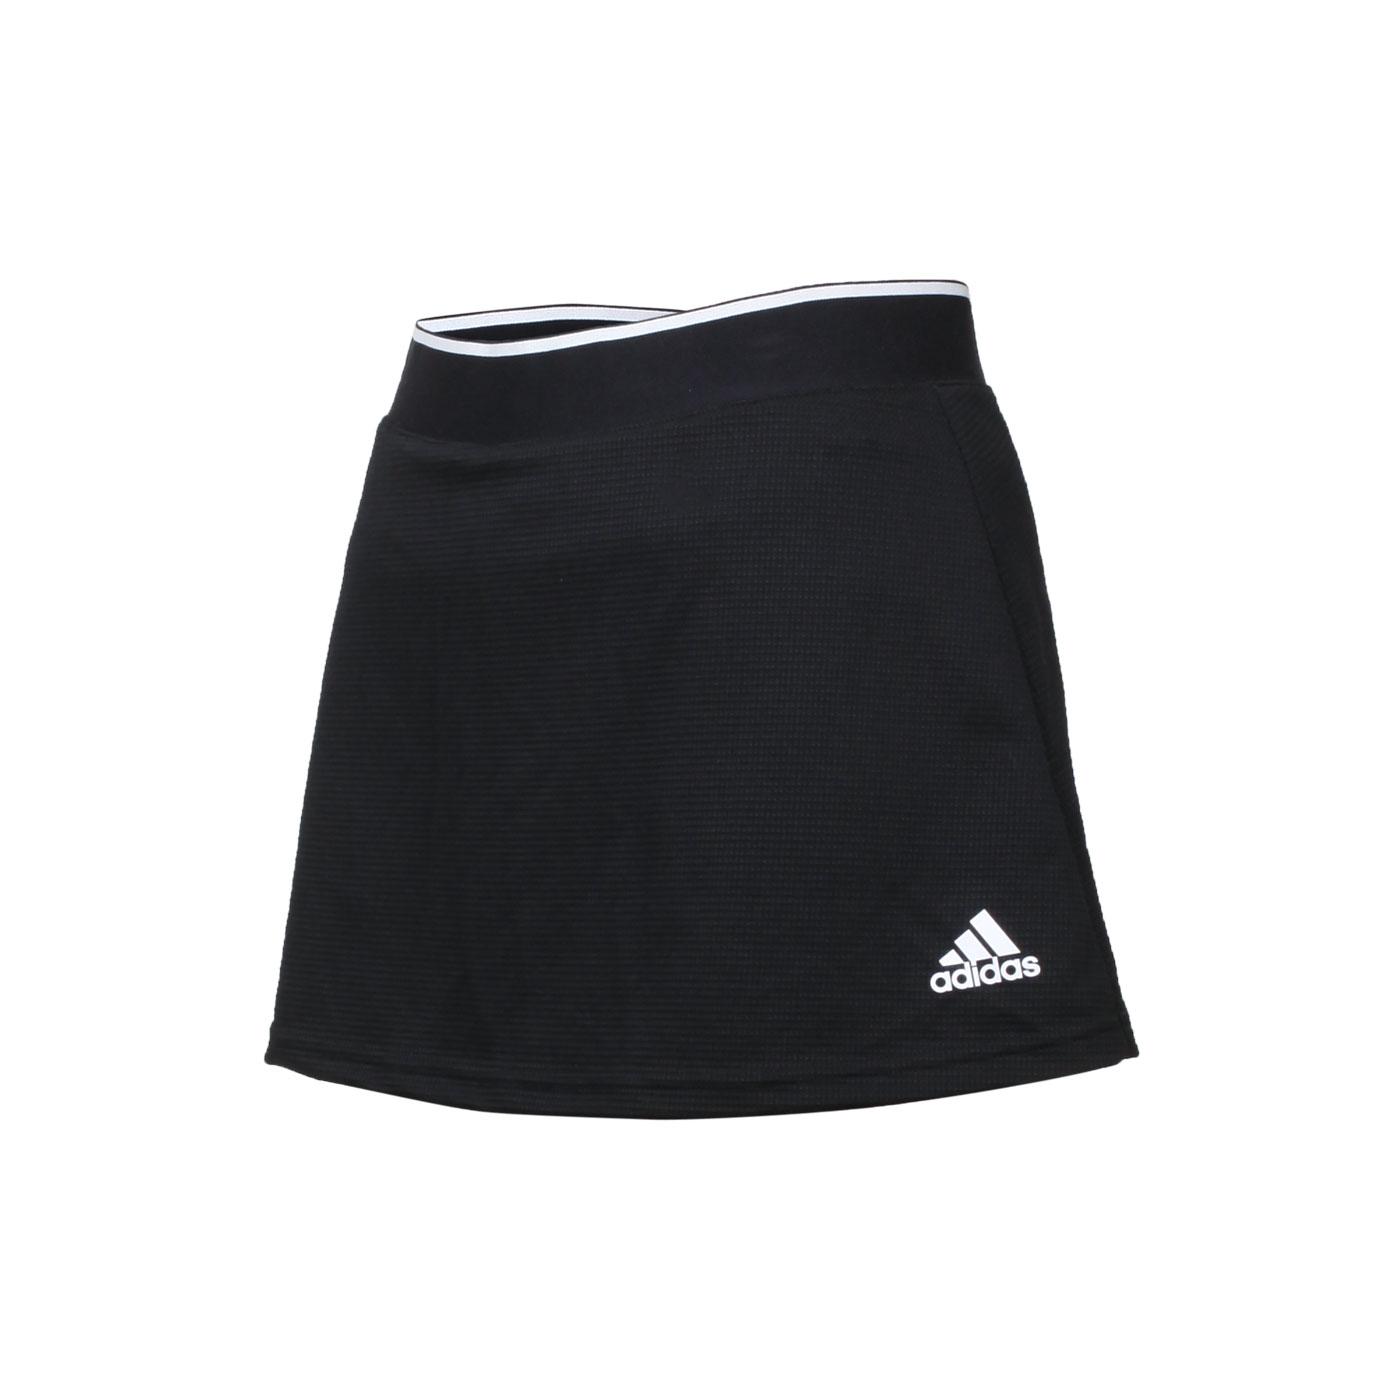 ADIDAS 女款短裙 GL5480 - 黑白